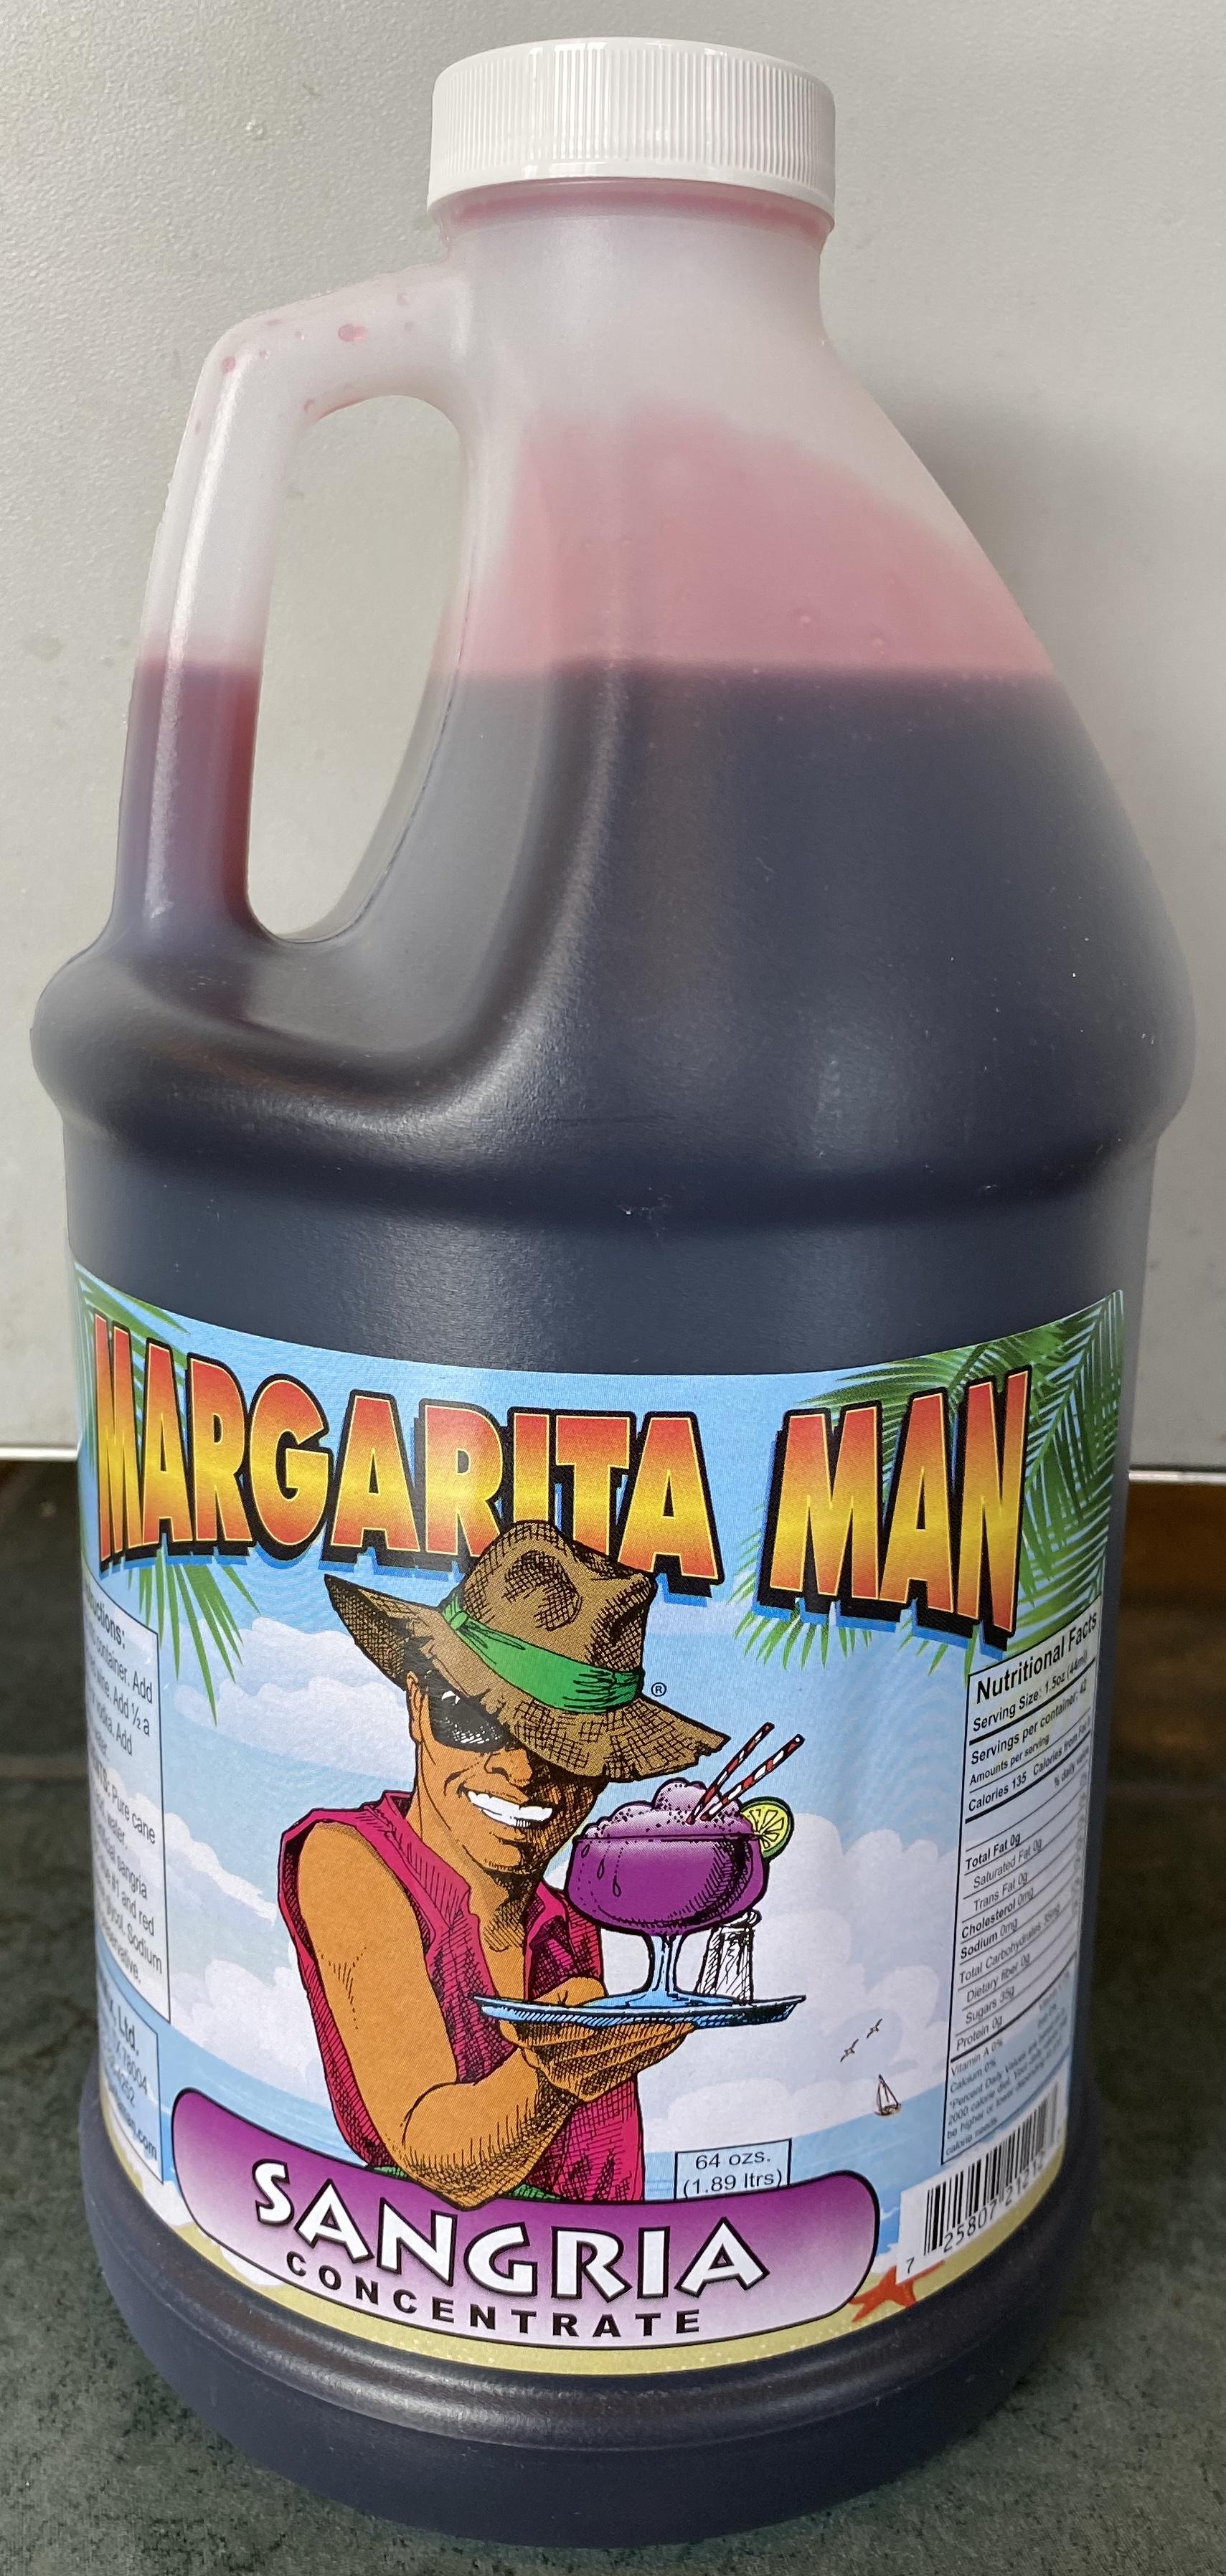 Margarita Man Mrg11 Sangria Concentrate